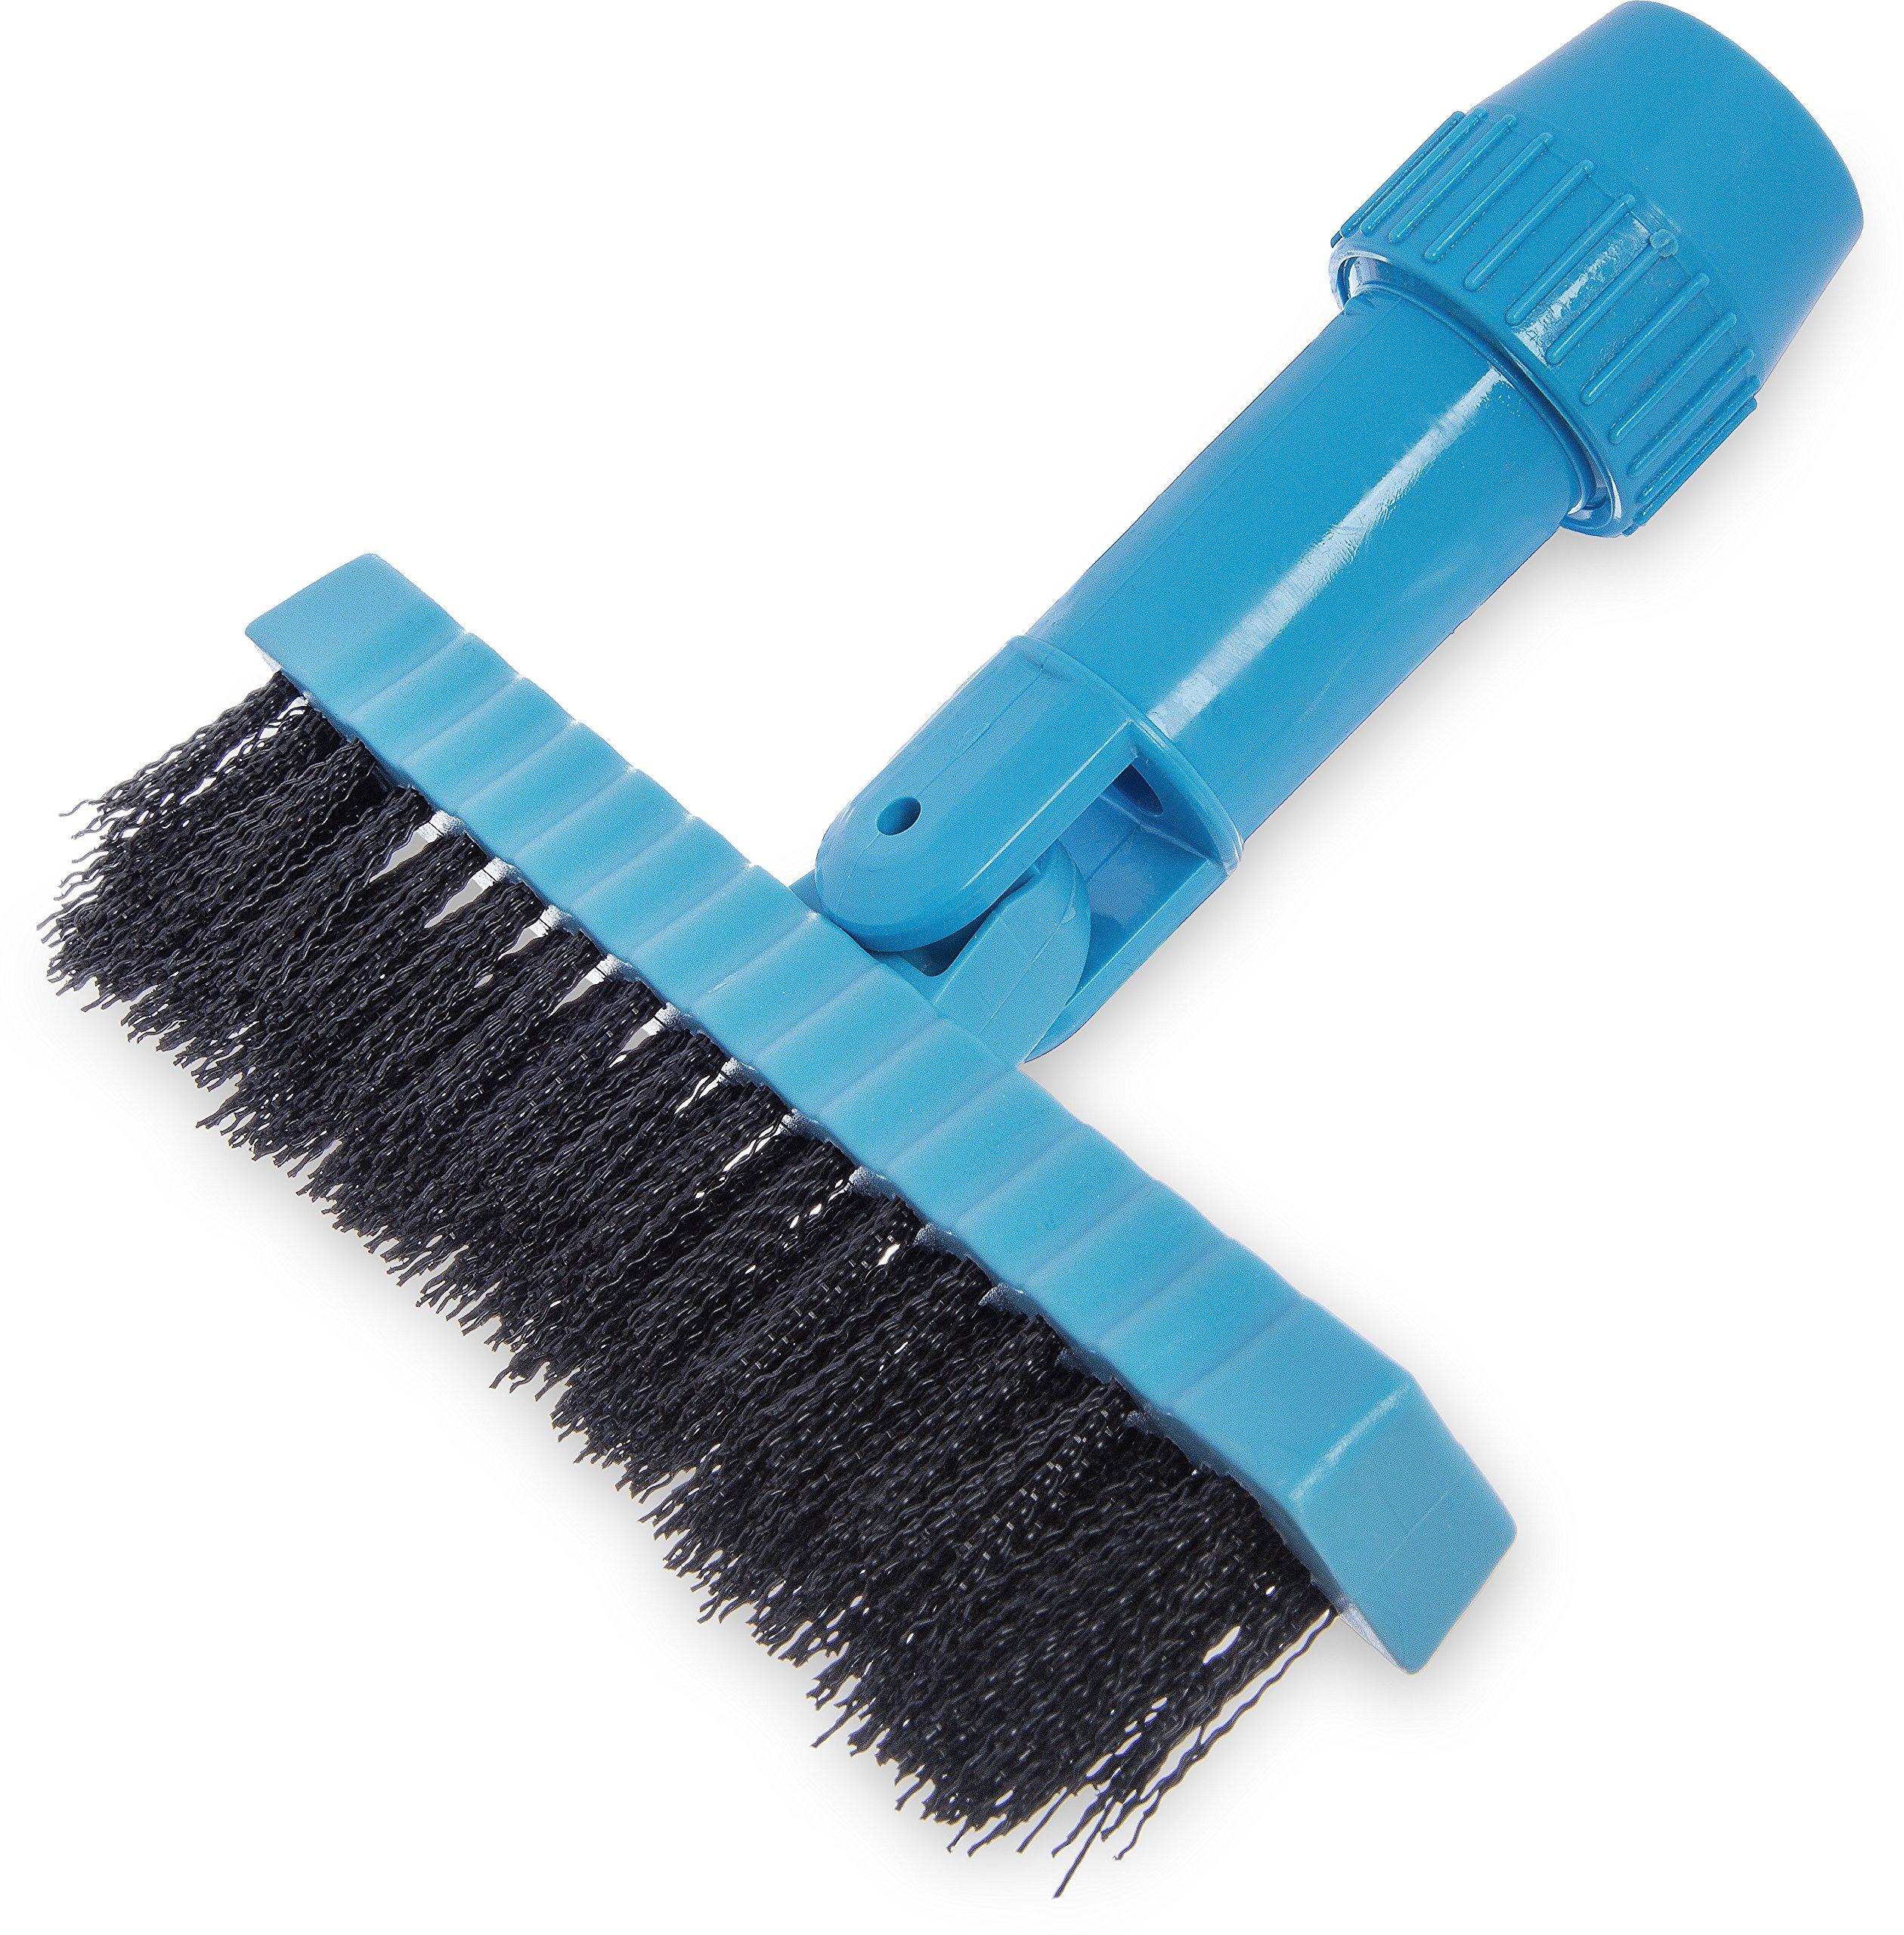 Carlisle 36532003 Swivel Head Grout Line Brush, Nylon Bristles, 1-1/4'' Bristle Trim, 7-1/2'' Length x 1'' Width, Black